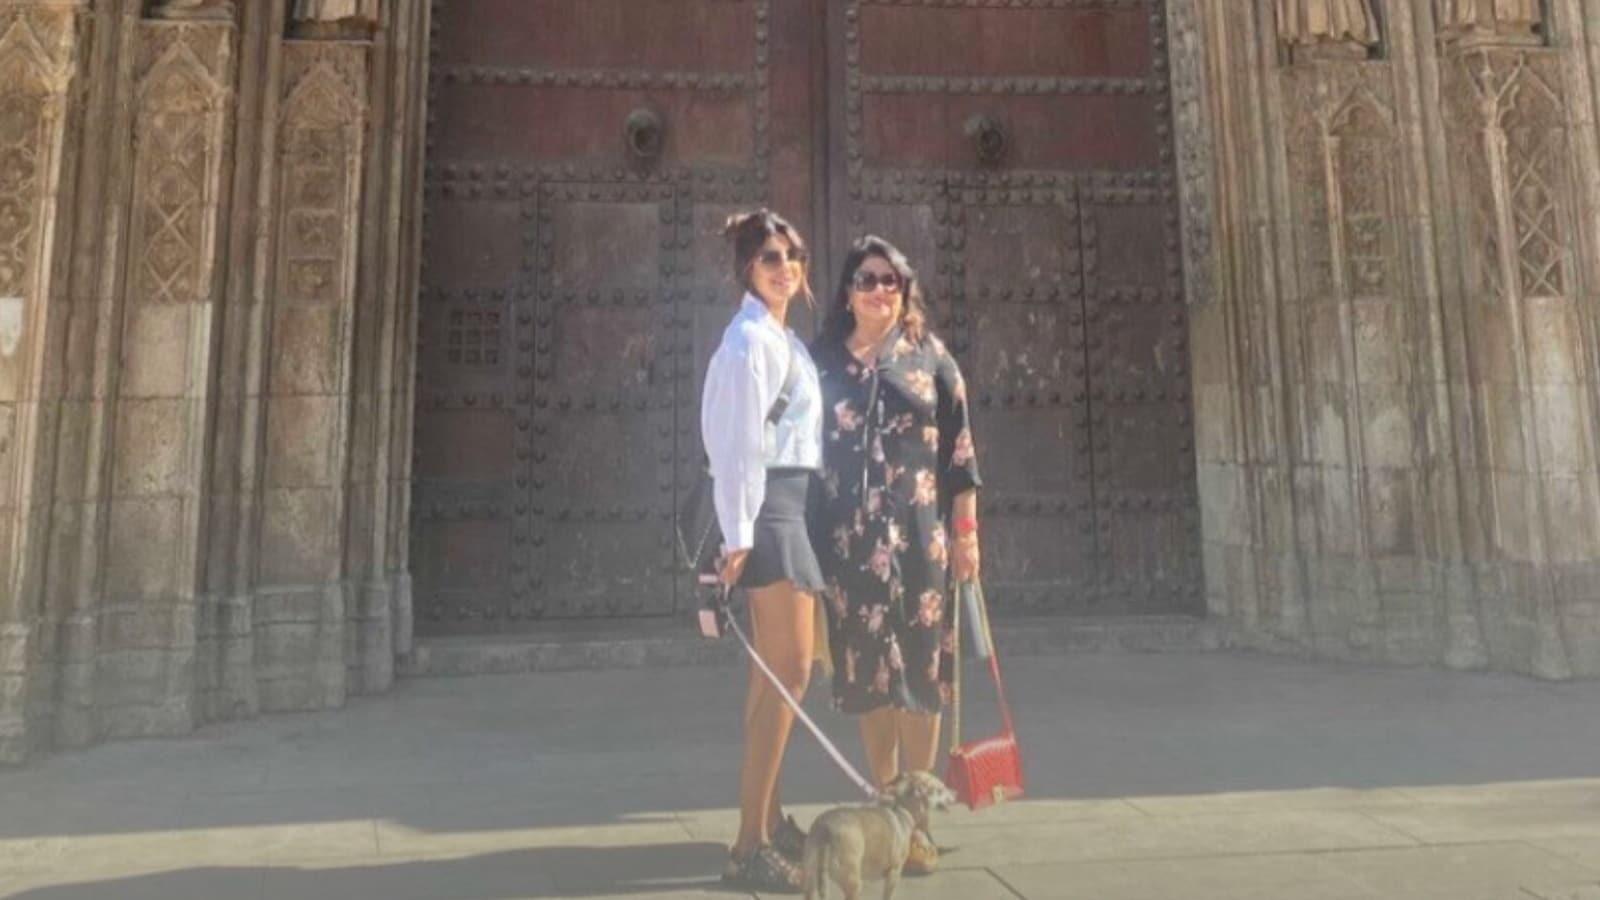 Priyanka Chopra takes time off Citadel shoot, goes sightseeing in Spain with mum and Diana. See pics | Bollywood - Hindustan Times